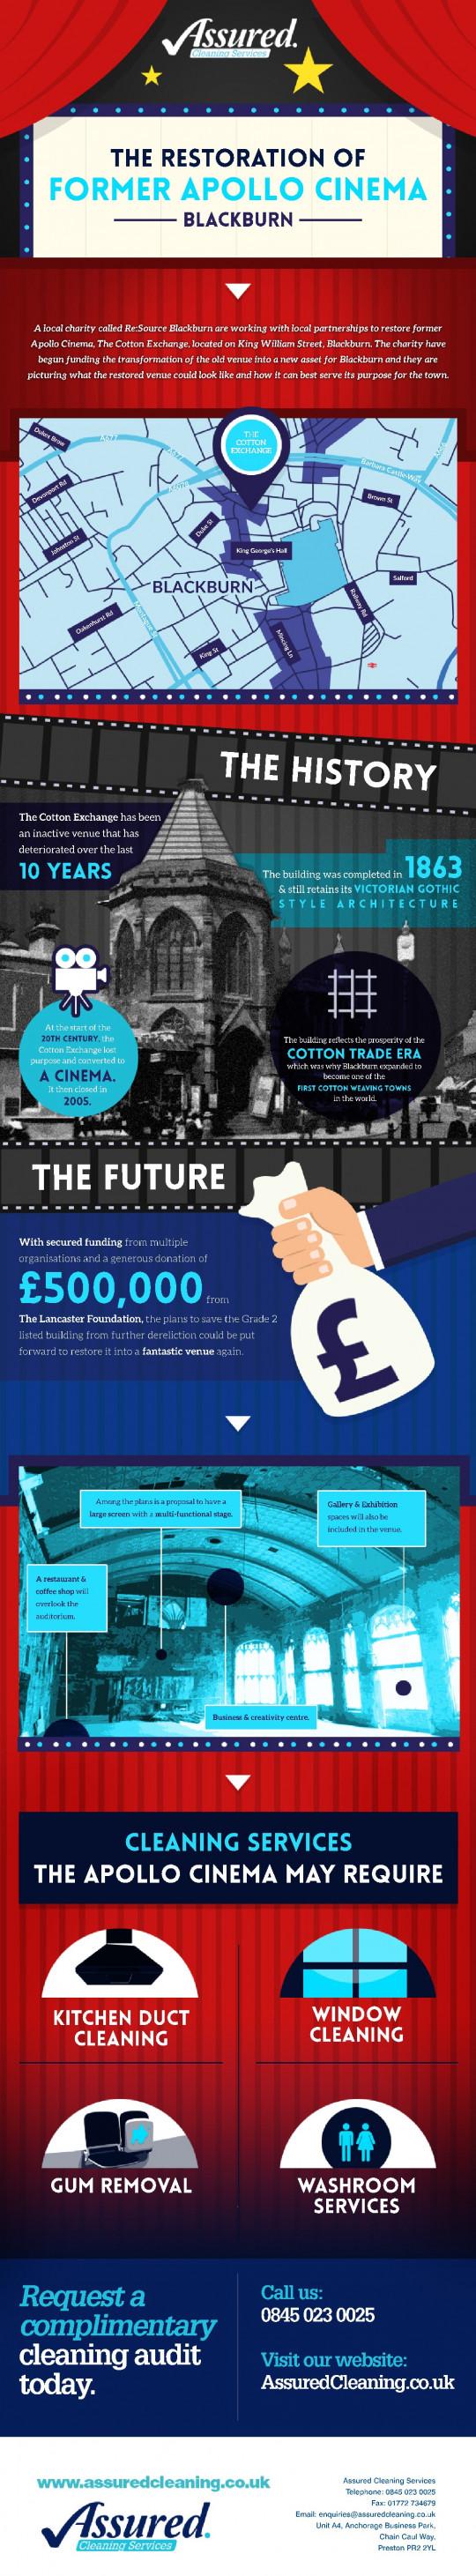 The Restoration of Former Apollo Cinema Blackburn